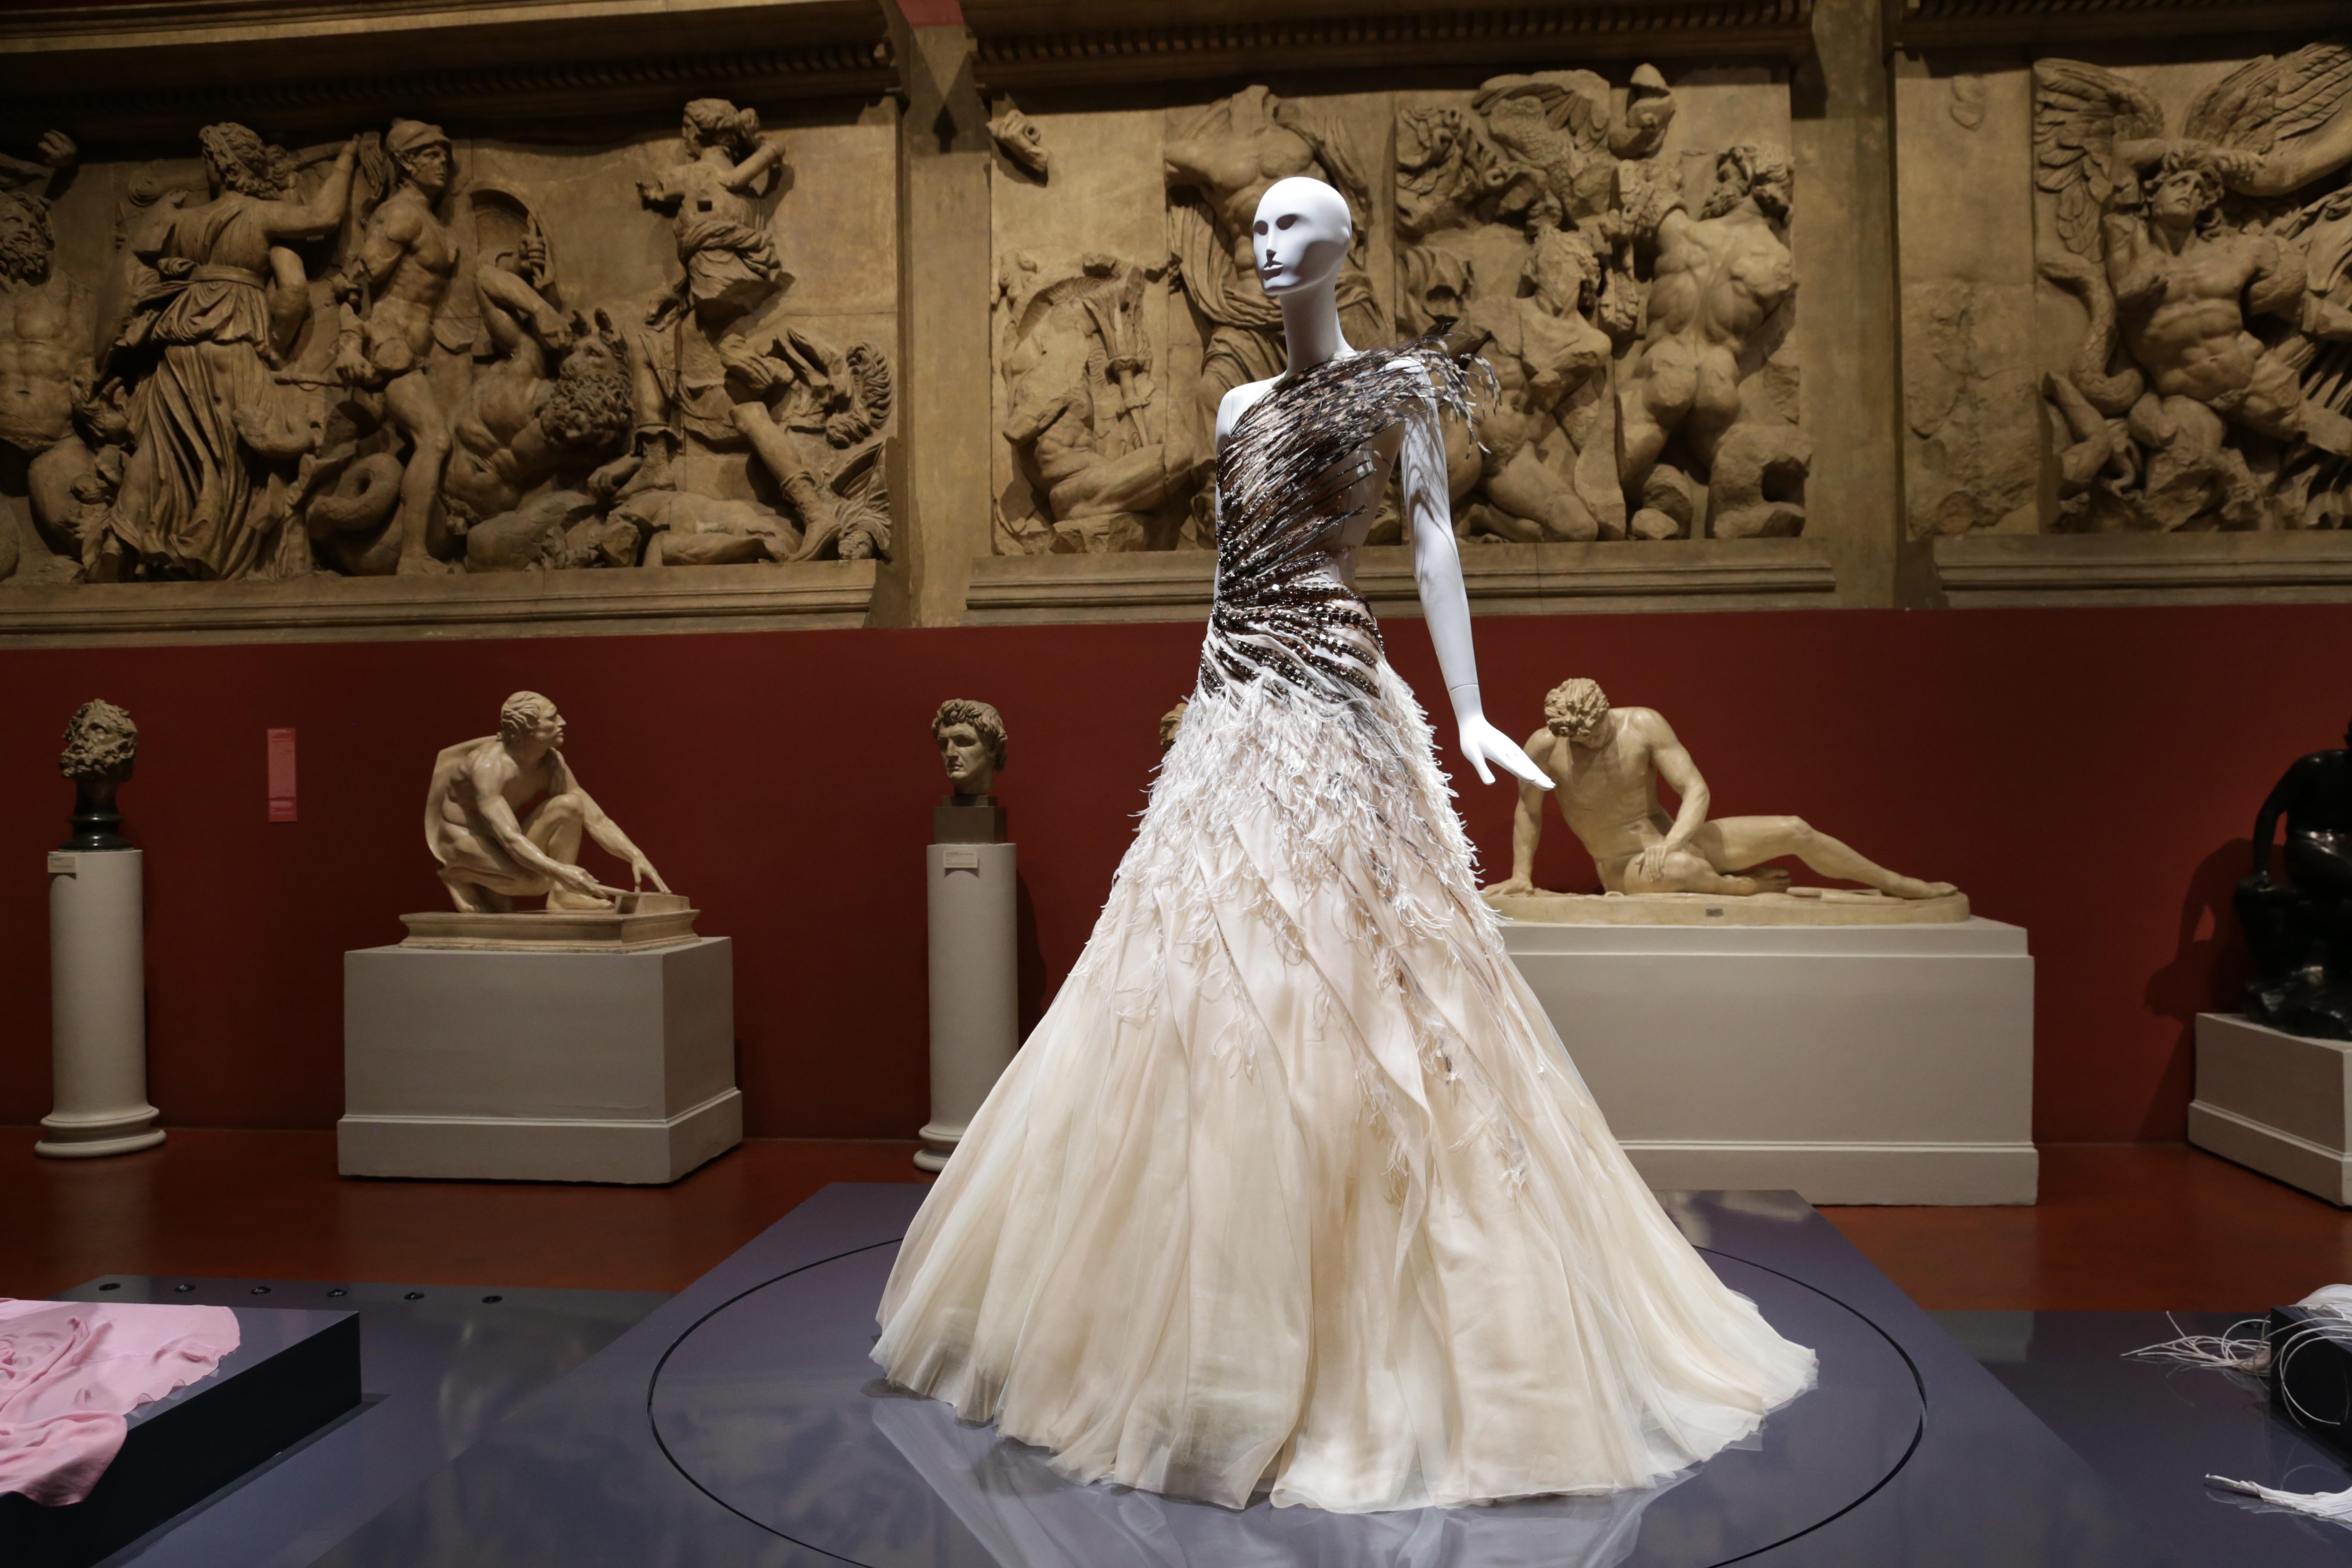 Free Images : man, people, woman, model, museum, fashion, wedding ...